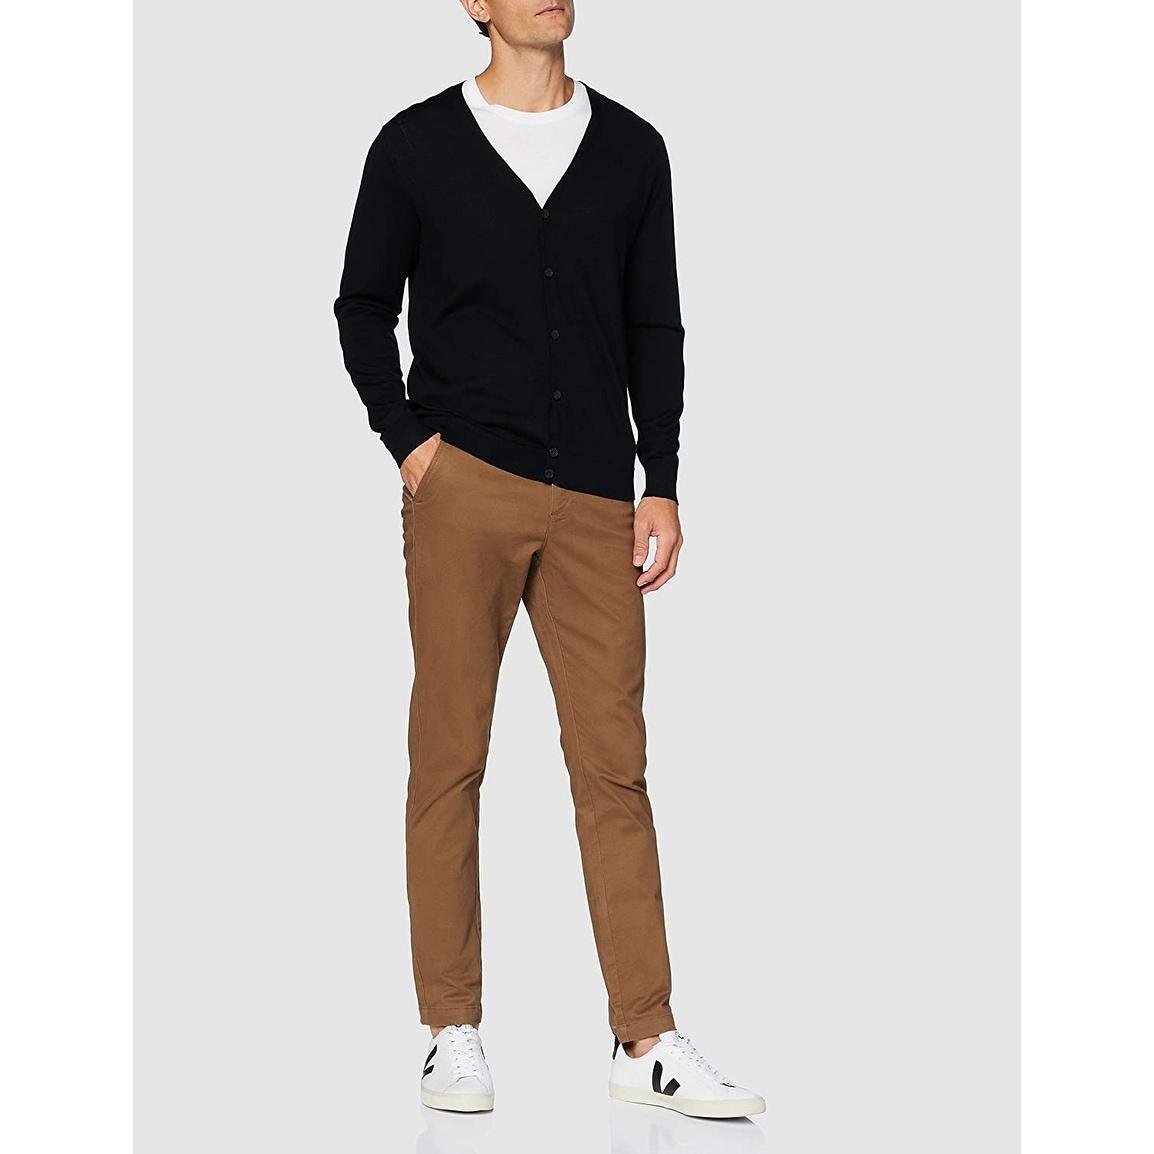 Brand V-Neck Sweater Slim Fit Merino Wool Meraki Mens  Fine Knit